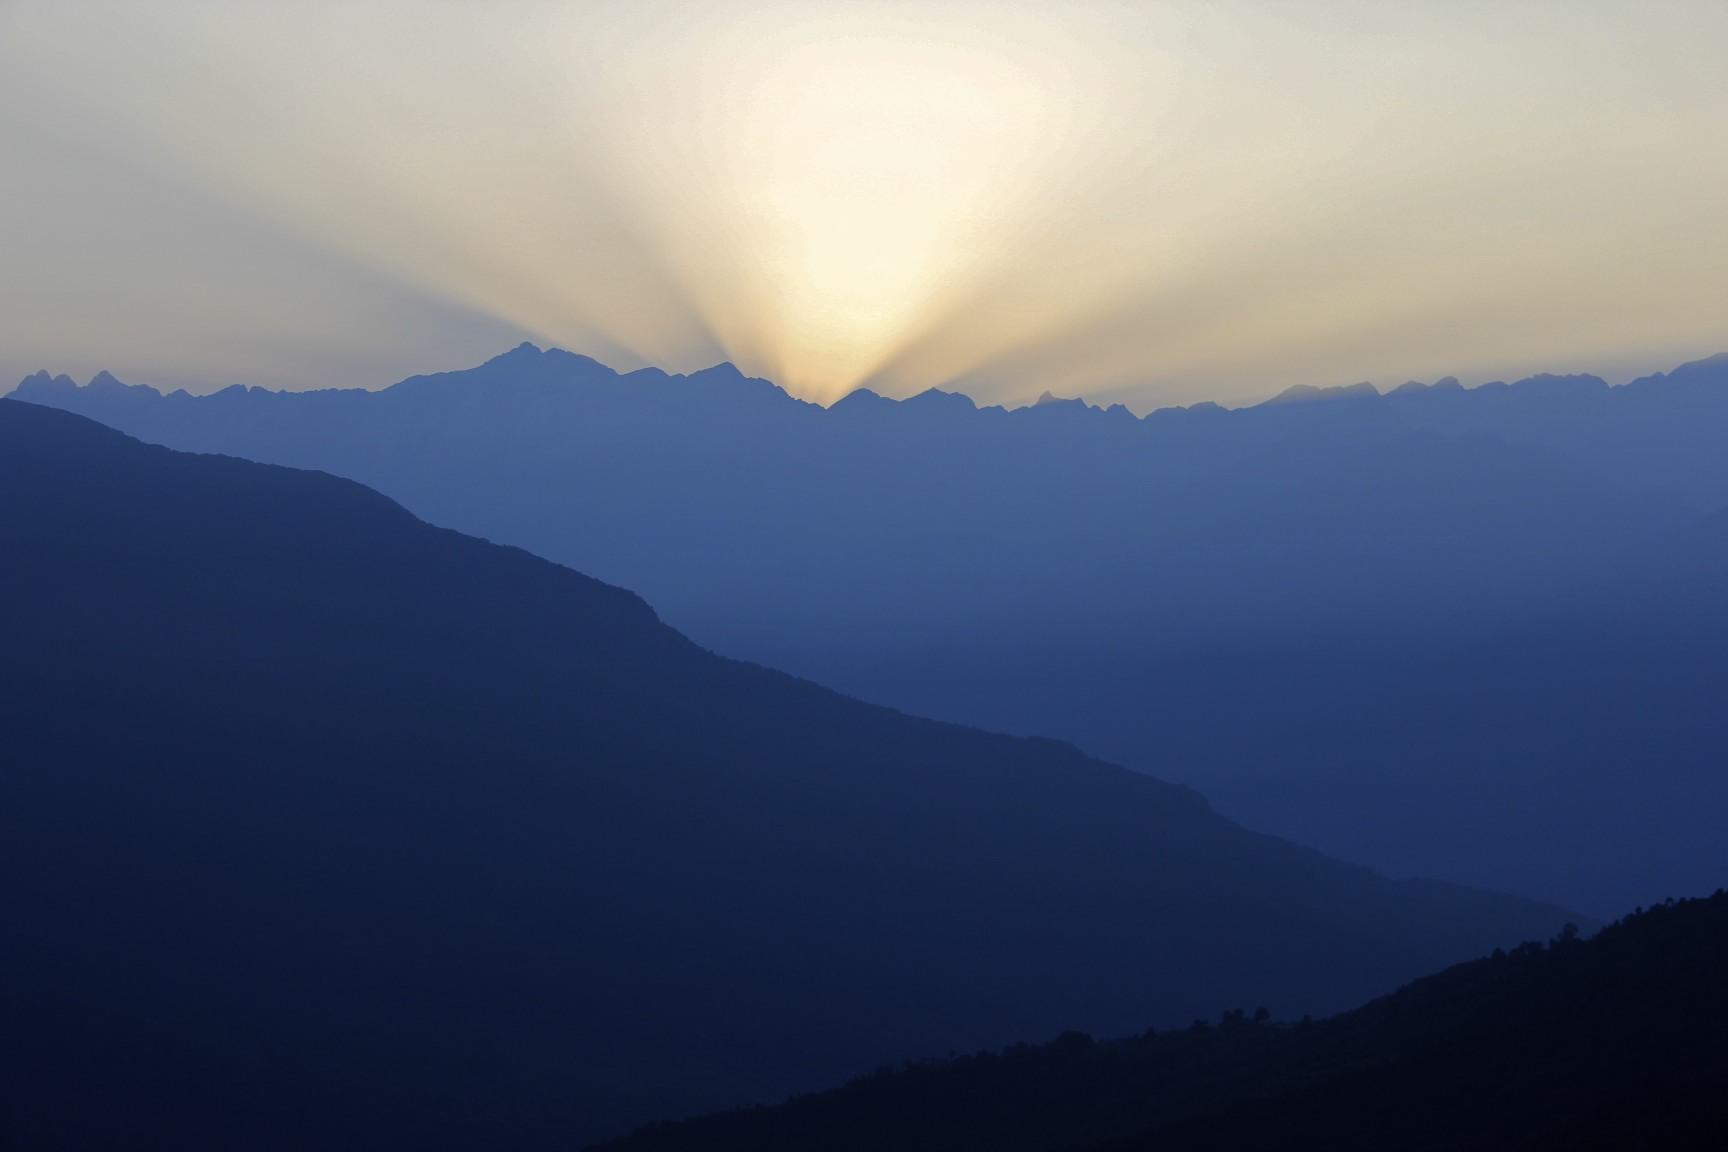 Sunrise over Kangchendzonga